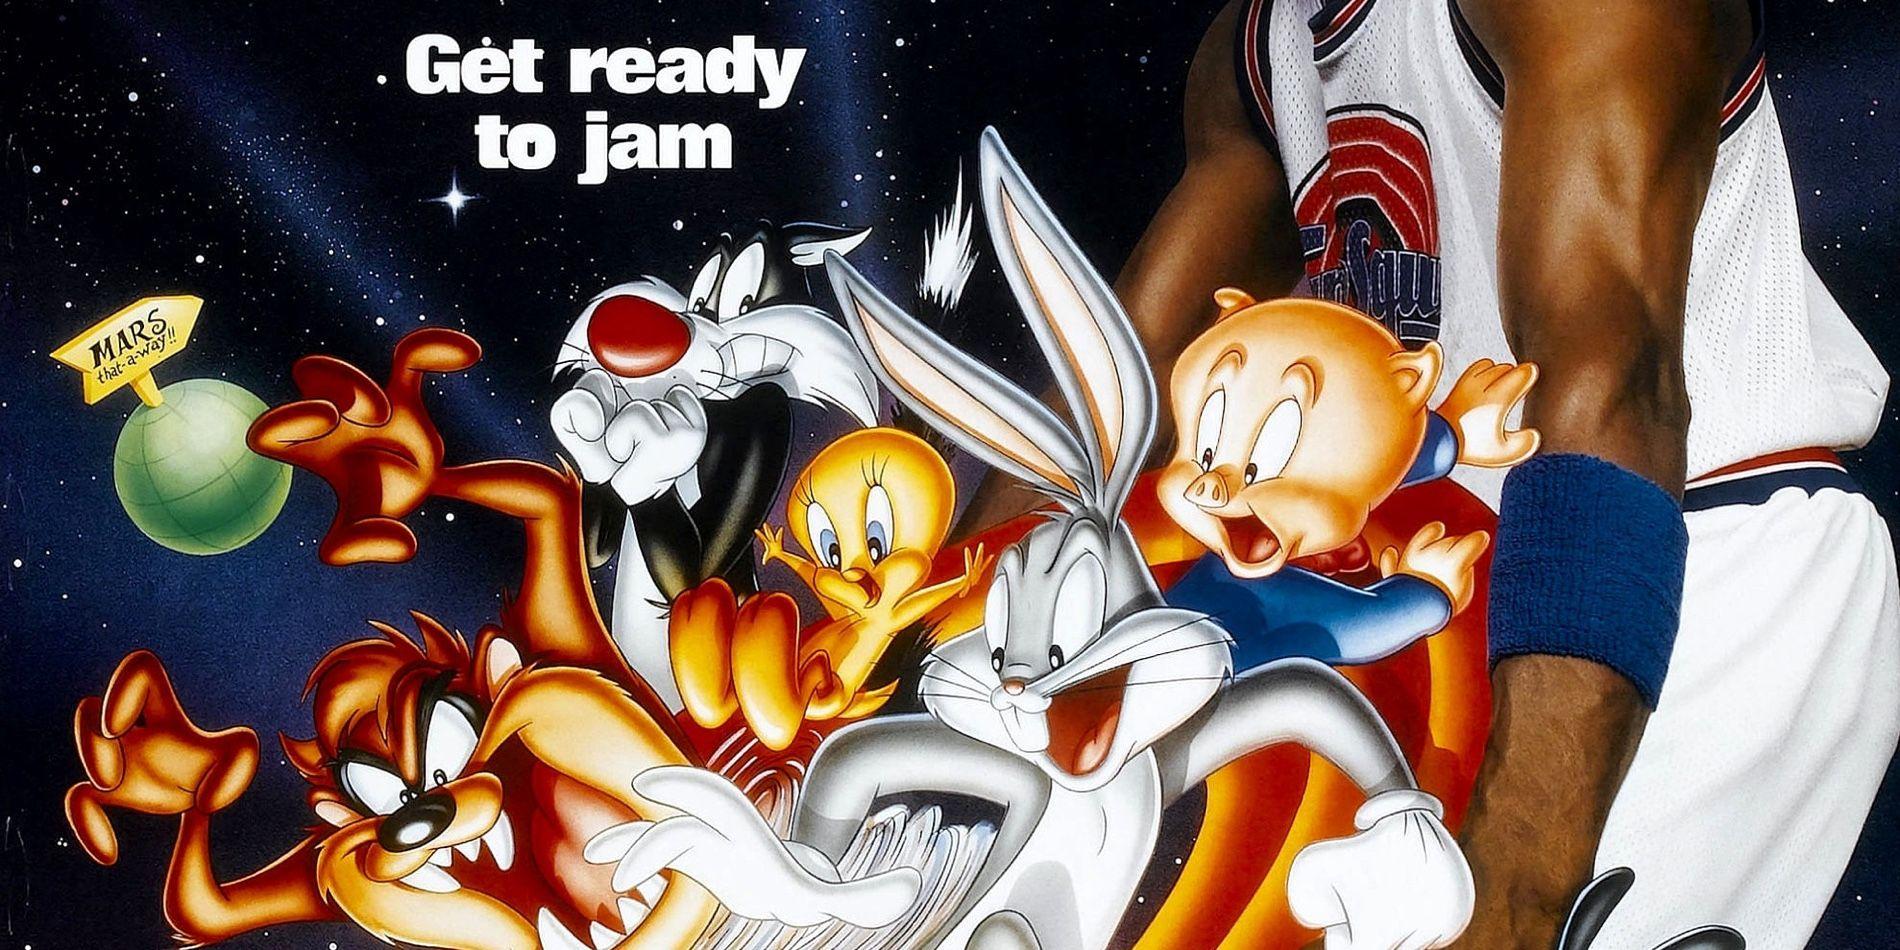 Space jam 2 release date in Sydney